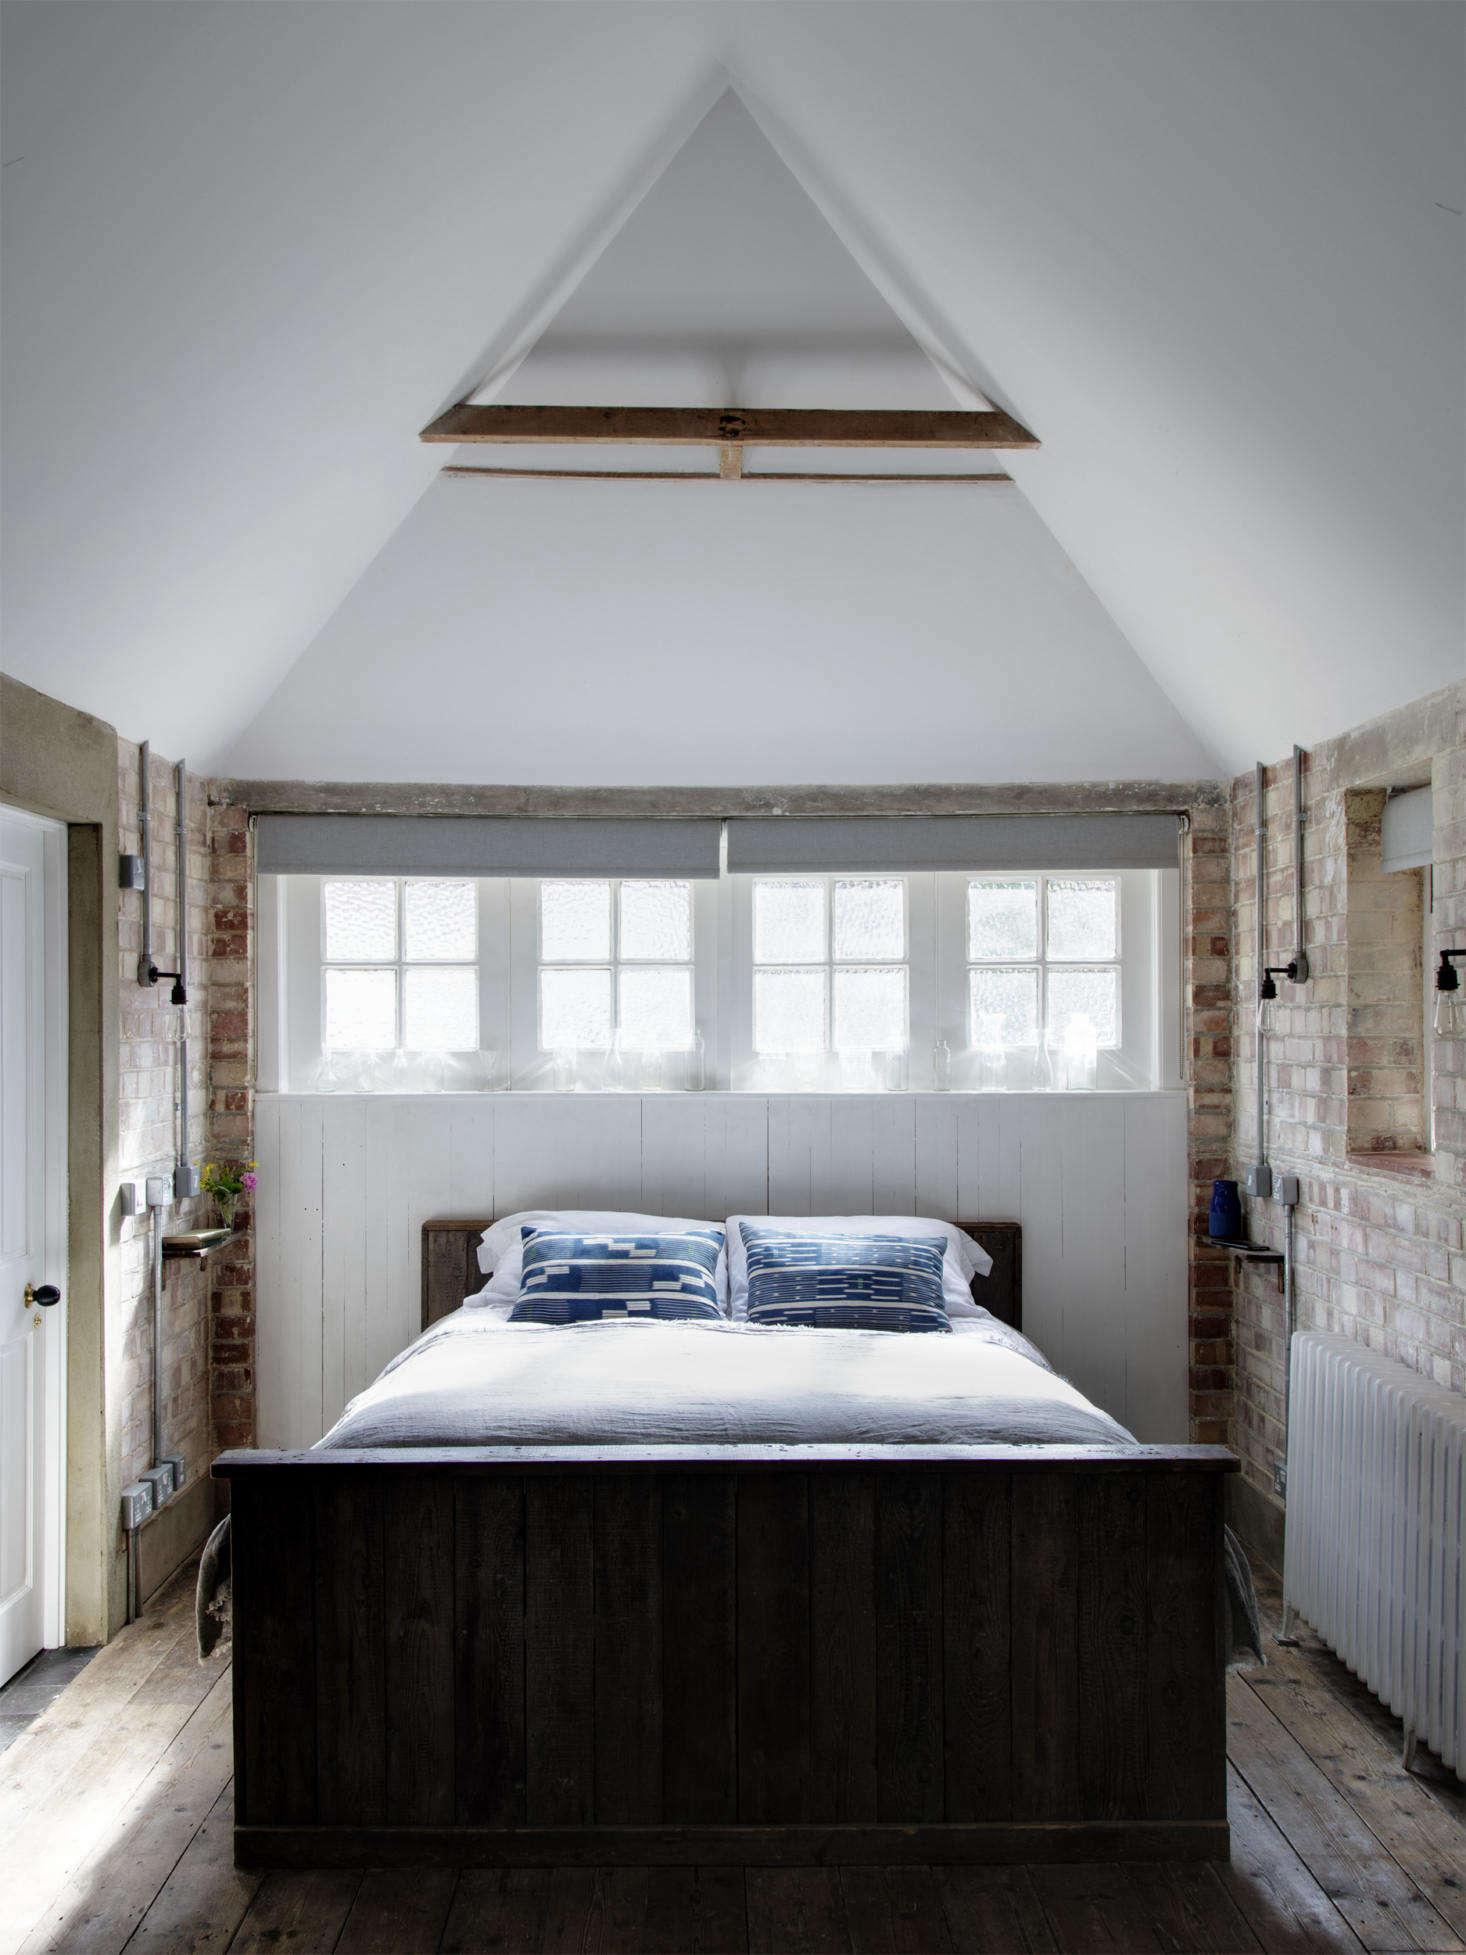 Designer Mark Lewis transformed an unloved garage into &#8